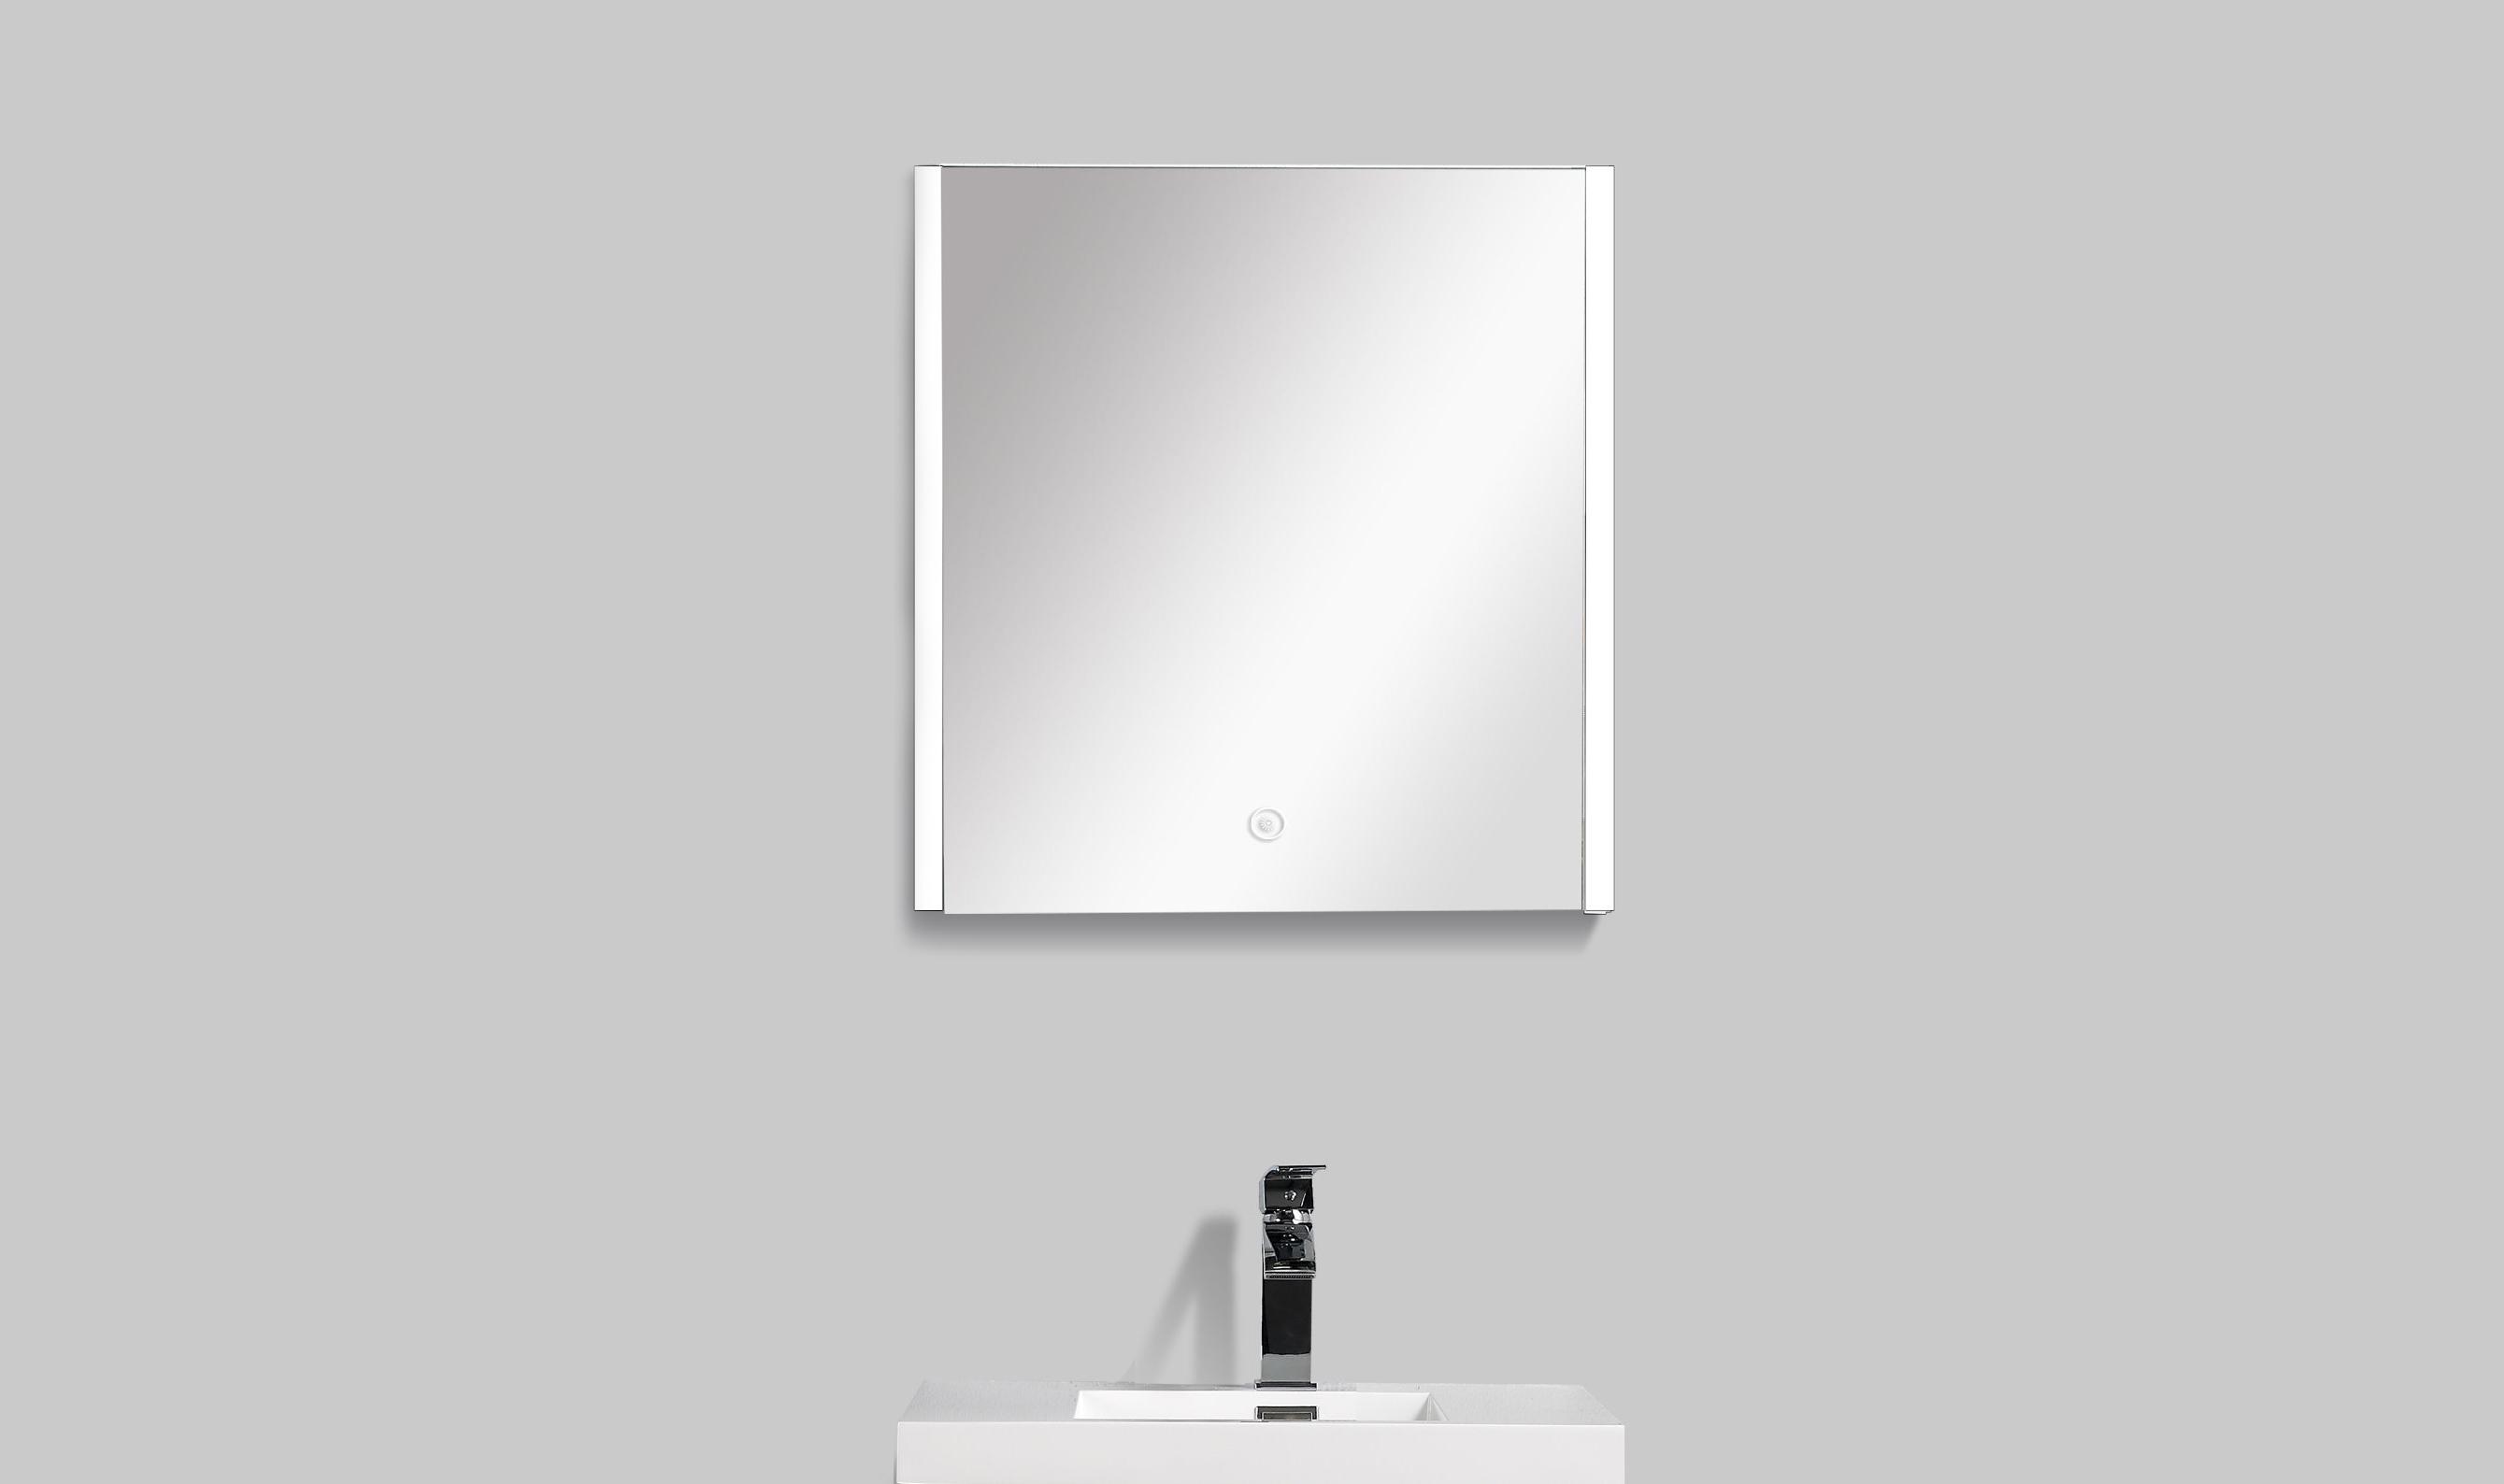 LED Badspiegel ENCIRO 60